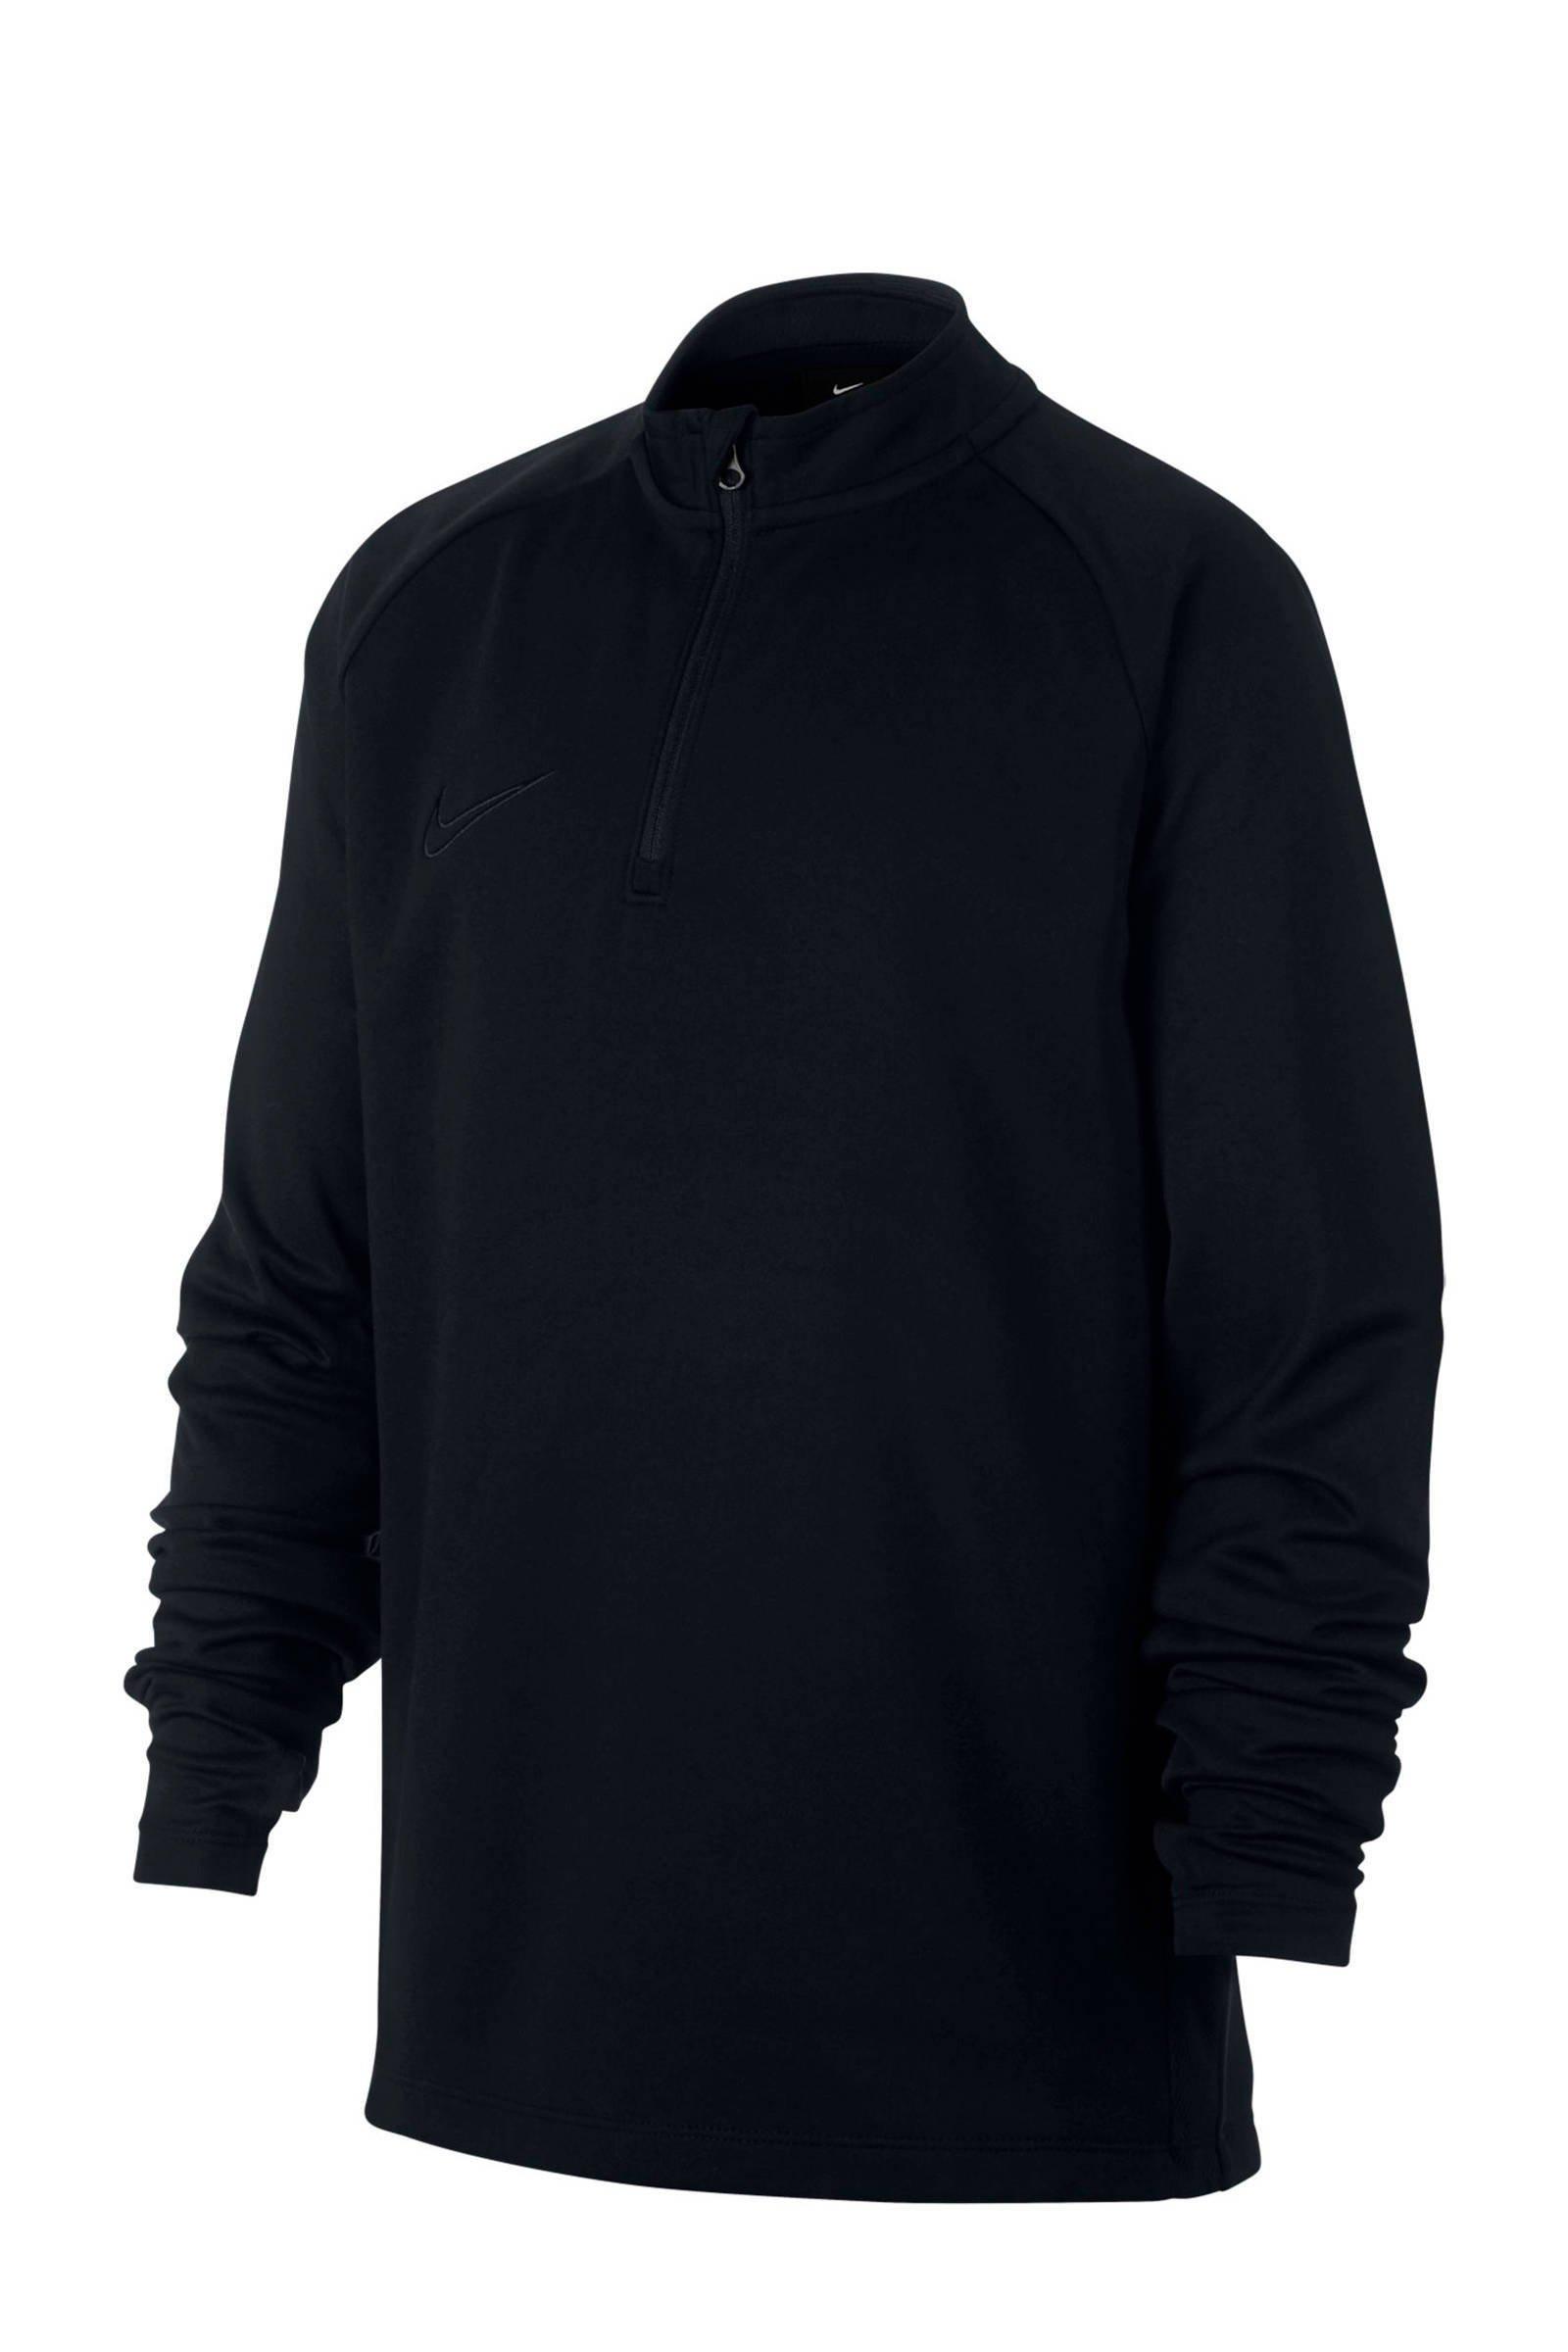 Nike voetbalshirt zwart - maat 140/152